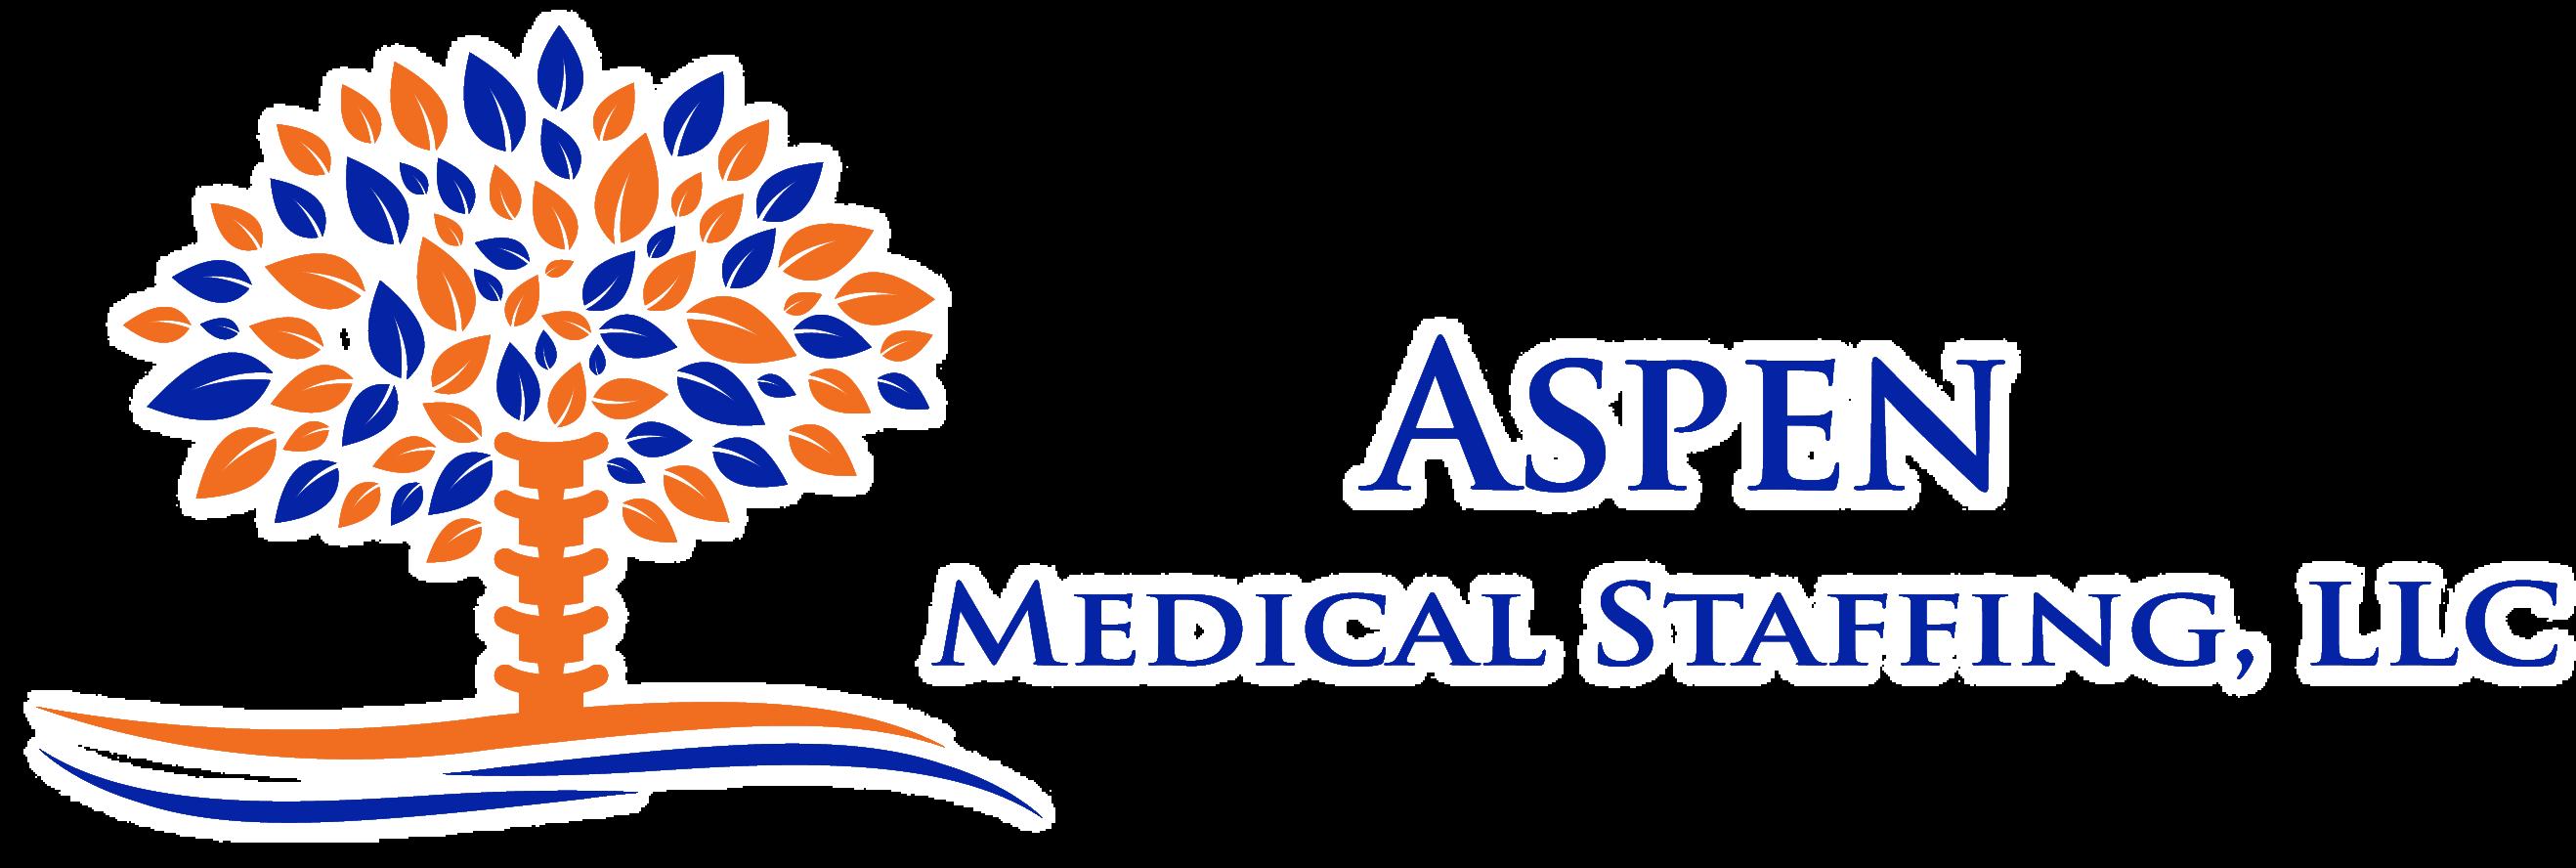 Aspen Medical Staffing LLC.